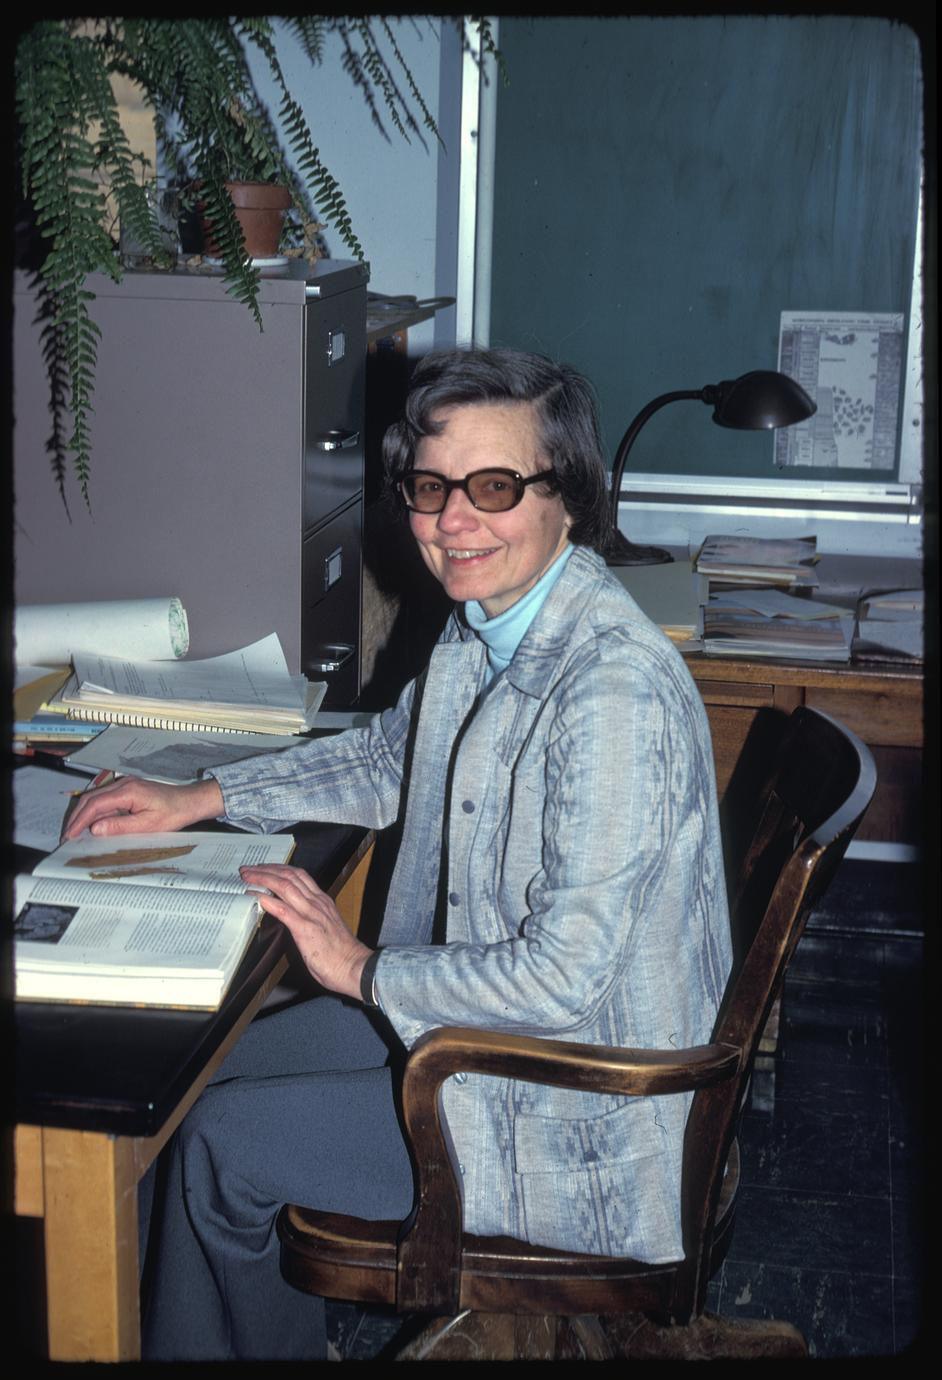 Gina at Birge Hall, Department of Botany, University of Wisconsin - Madison